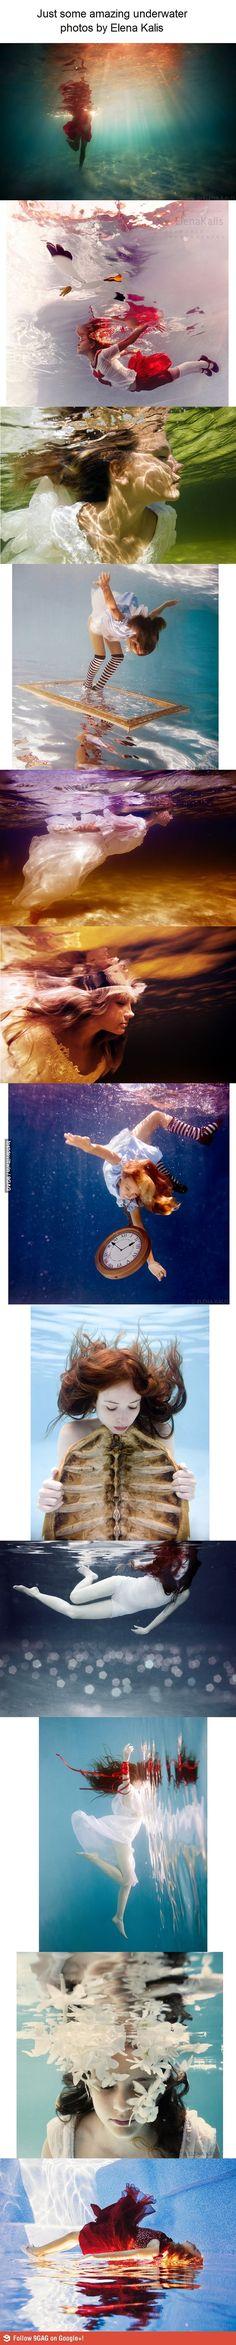 Some amazing underwater photos by Elena Kalis